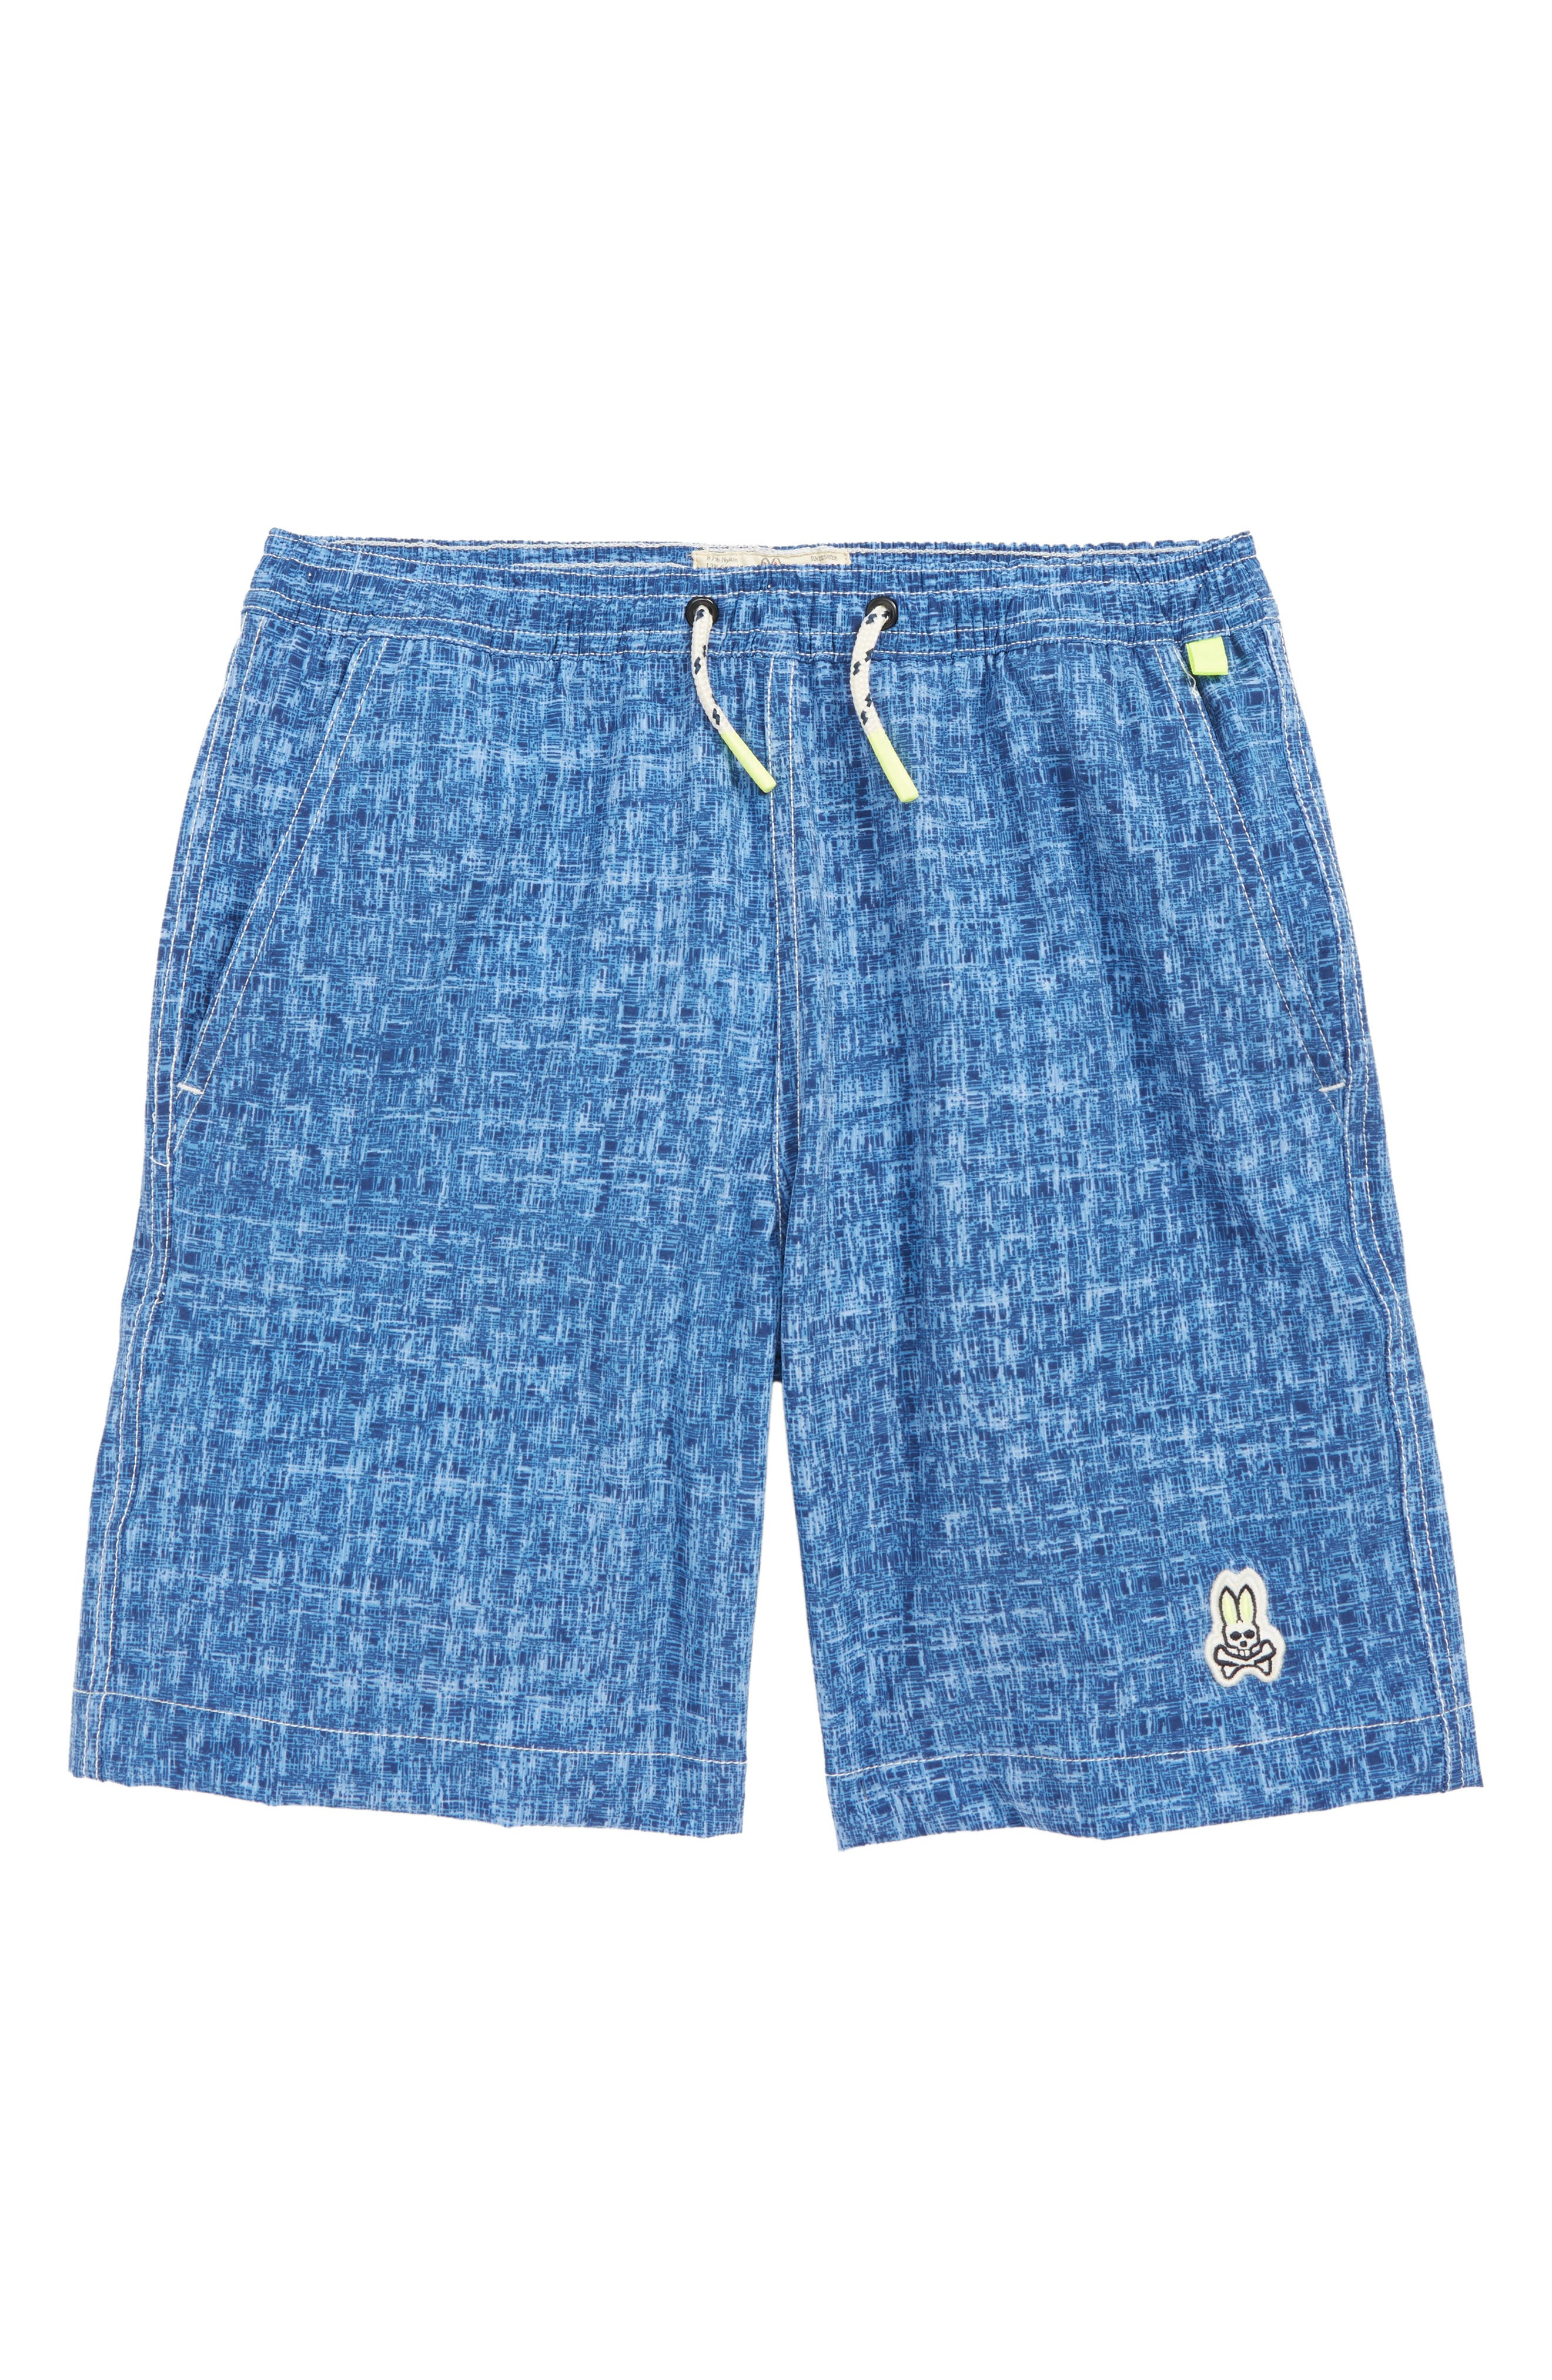 Billabong JACKSON BOYS Grey Blue Brown Plaid Pockets Boy/'s Shorts